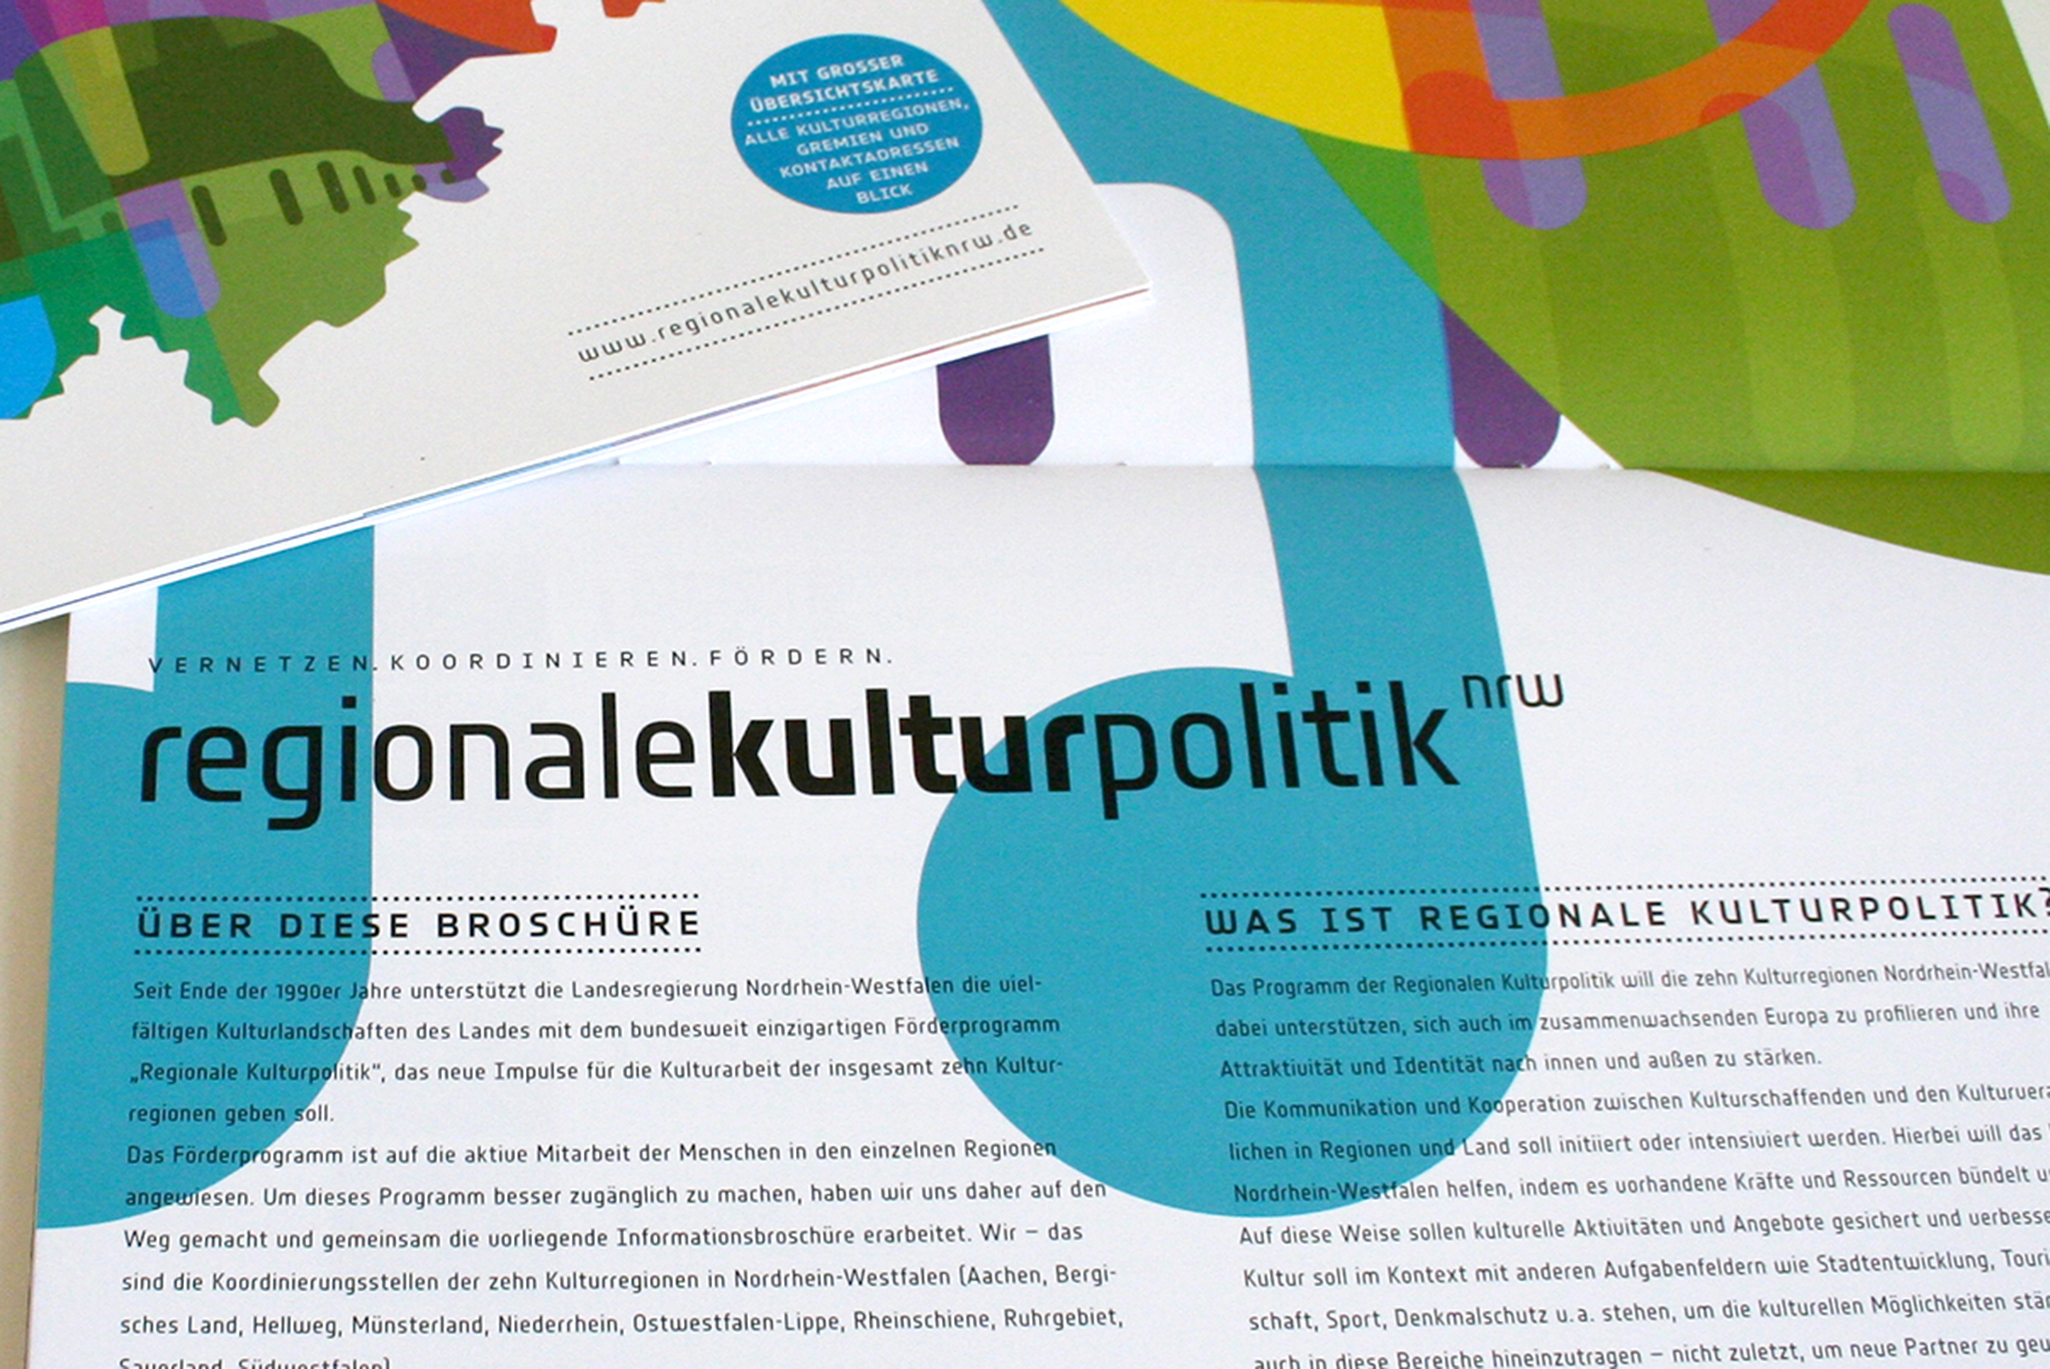 regionale kulturpolitik nrw